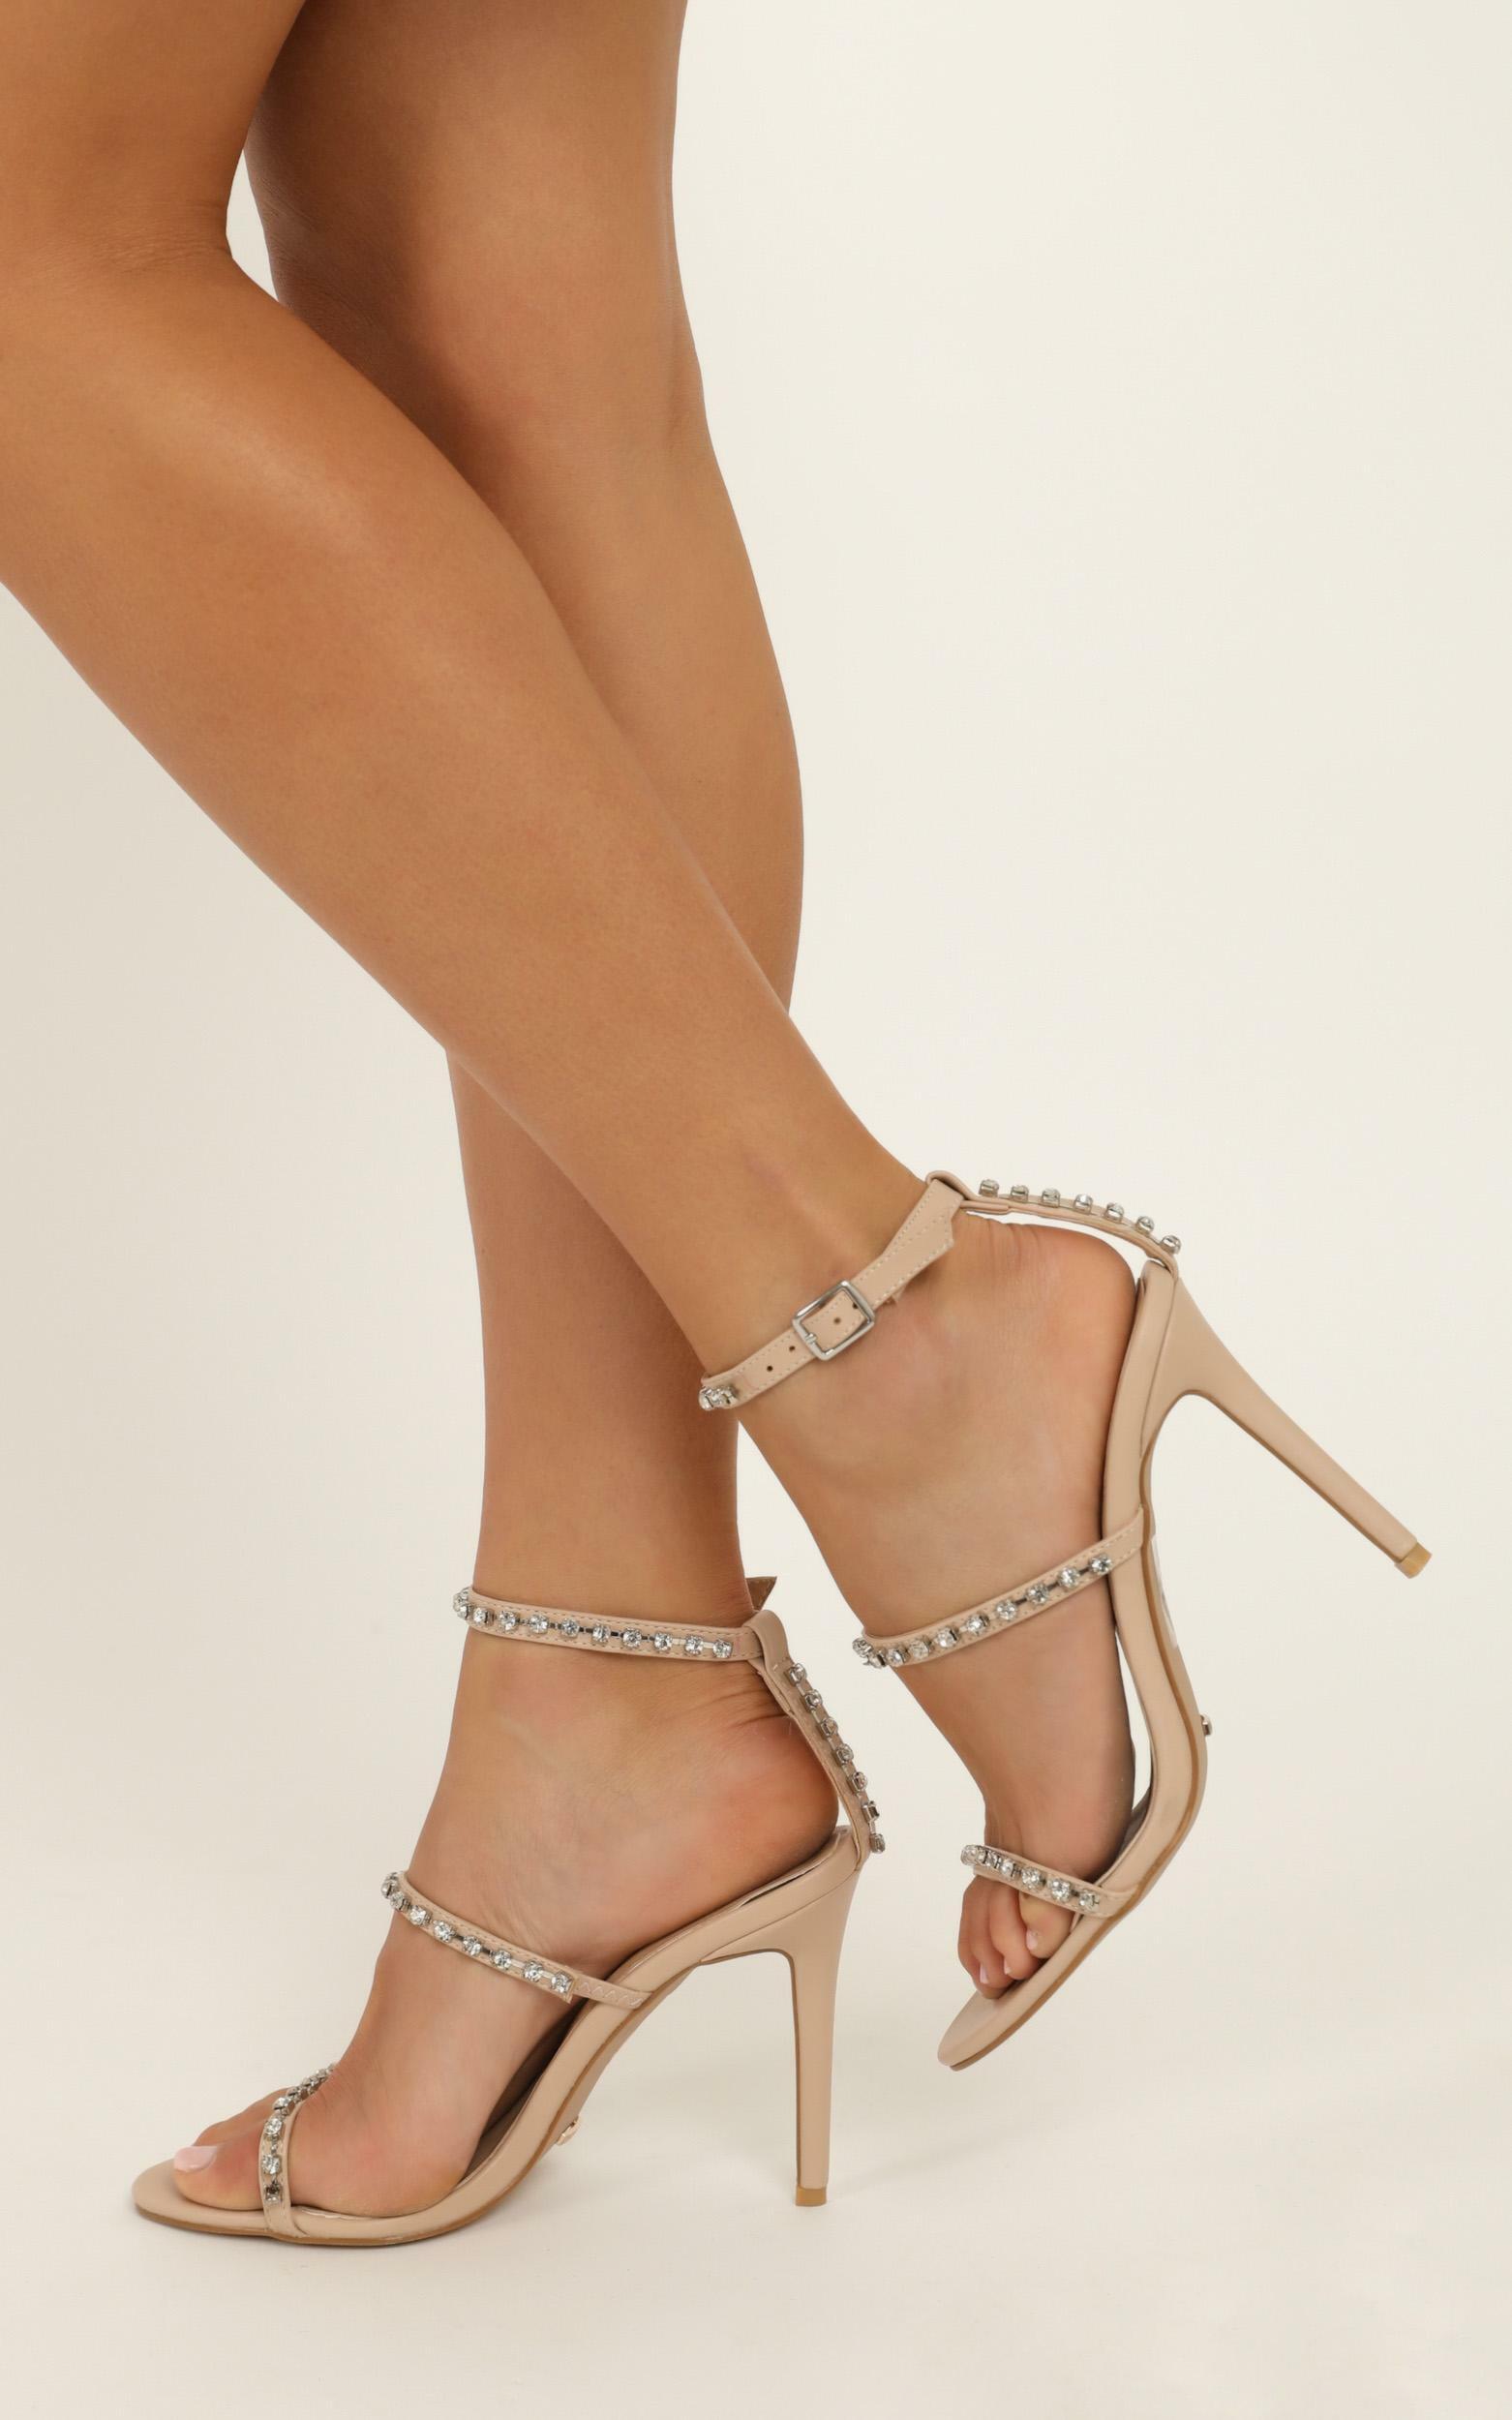 Billini - Talia Heels In nude - 10, Beige, hi-res image number null